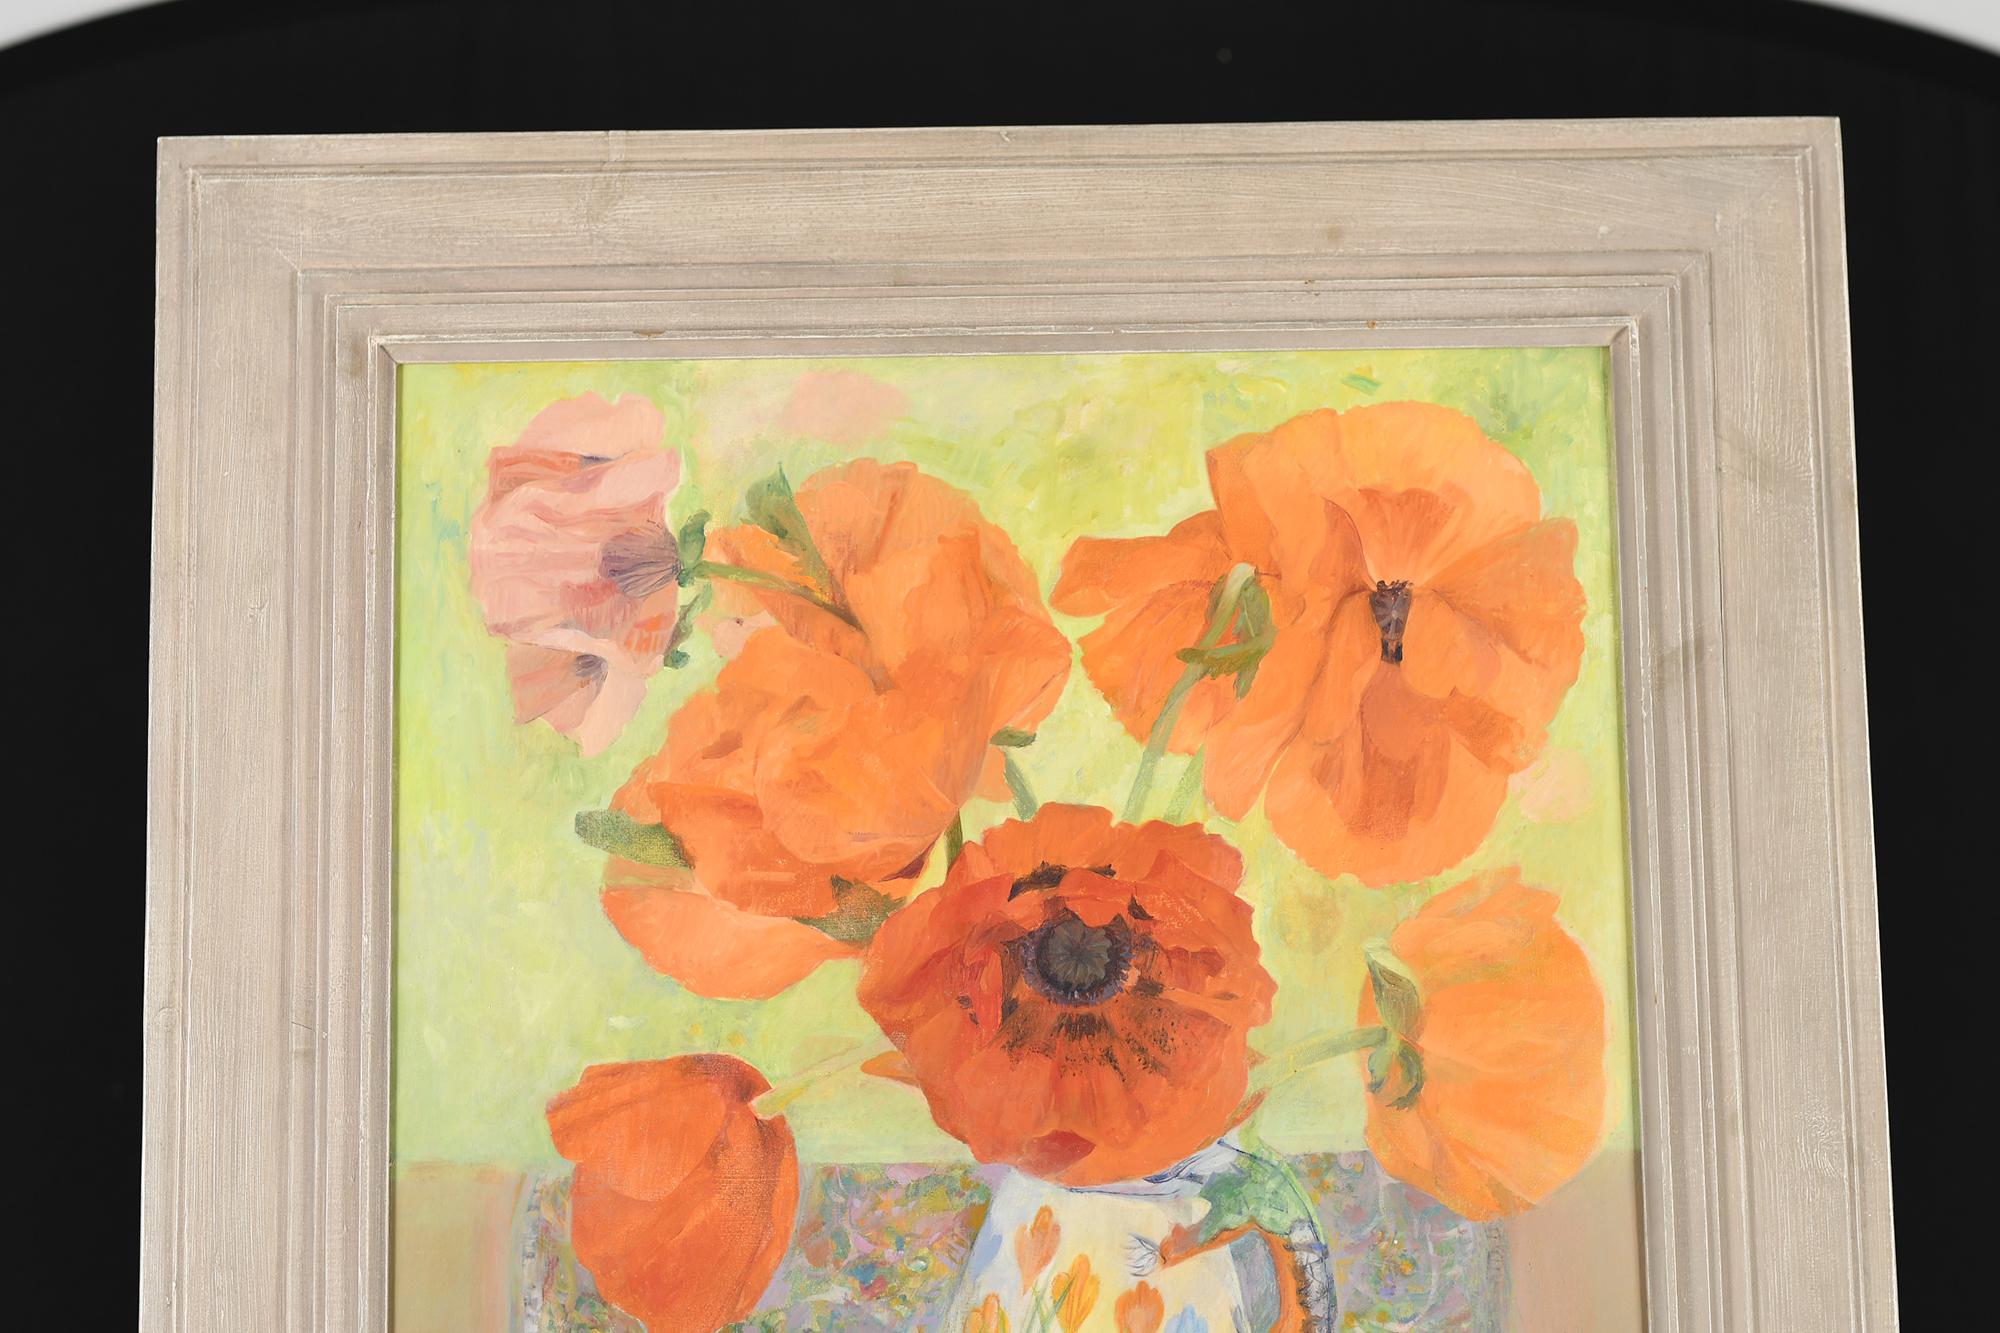 Original Oil Painting by Scottish Artist Ann Patrick. - Image 8 of 9